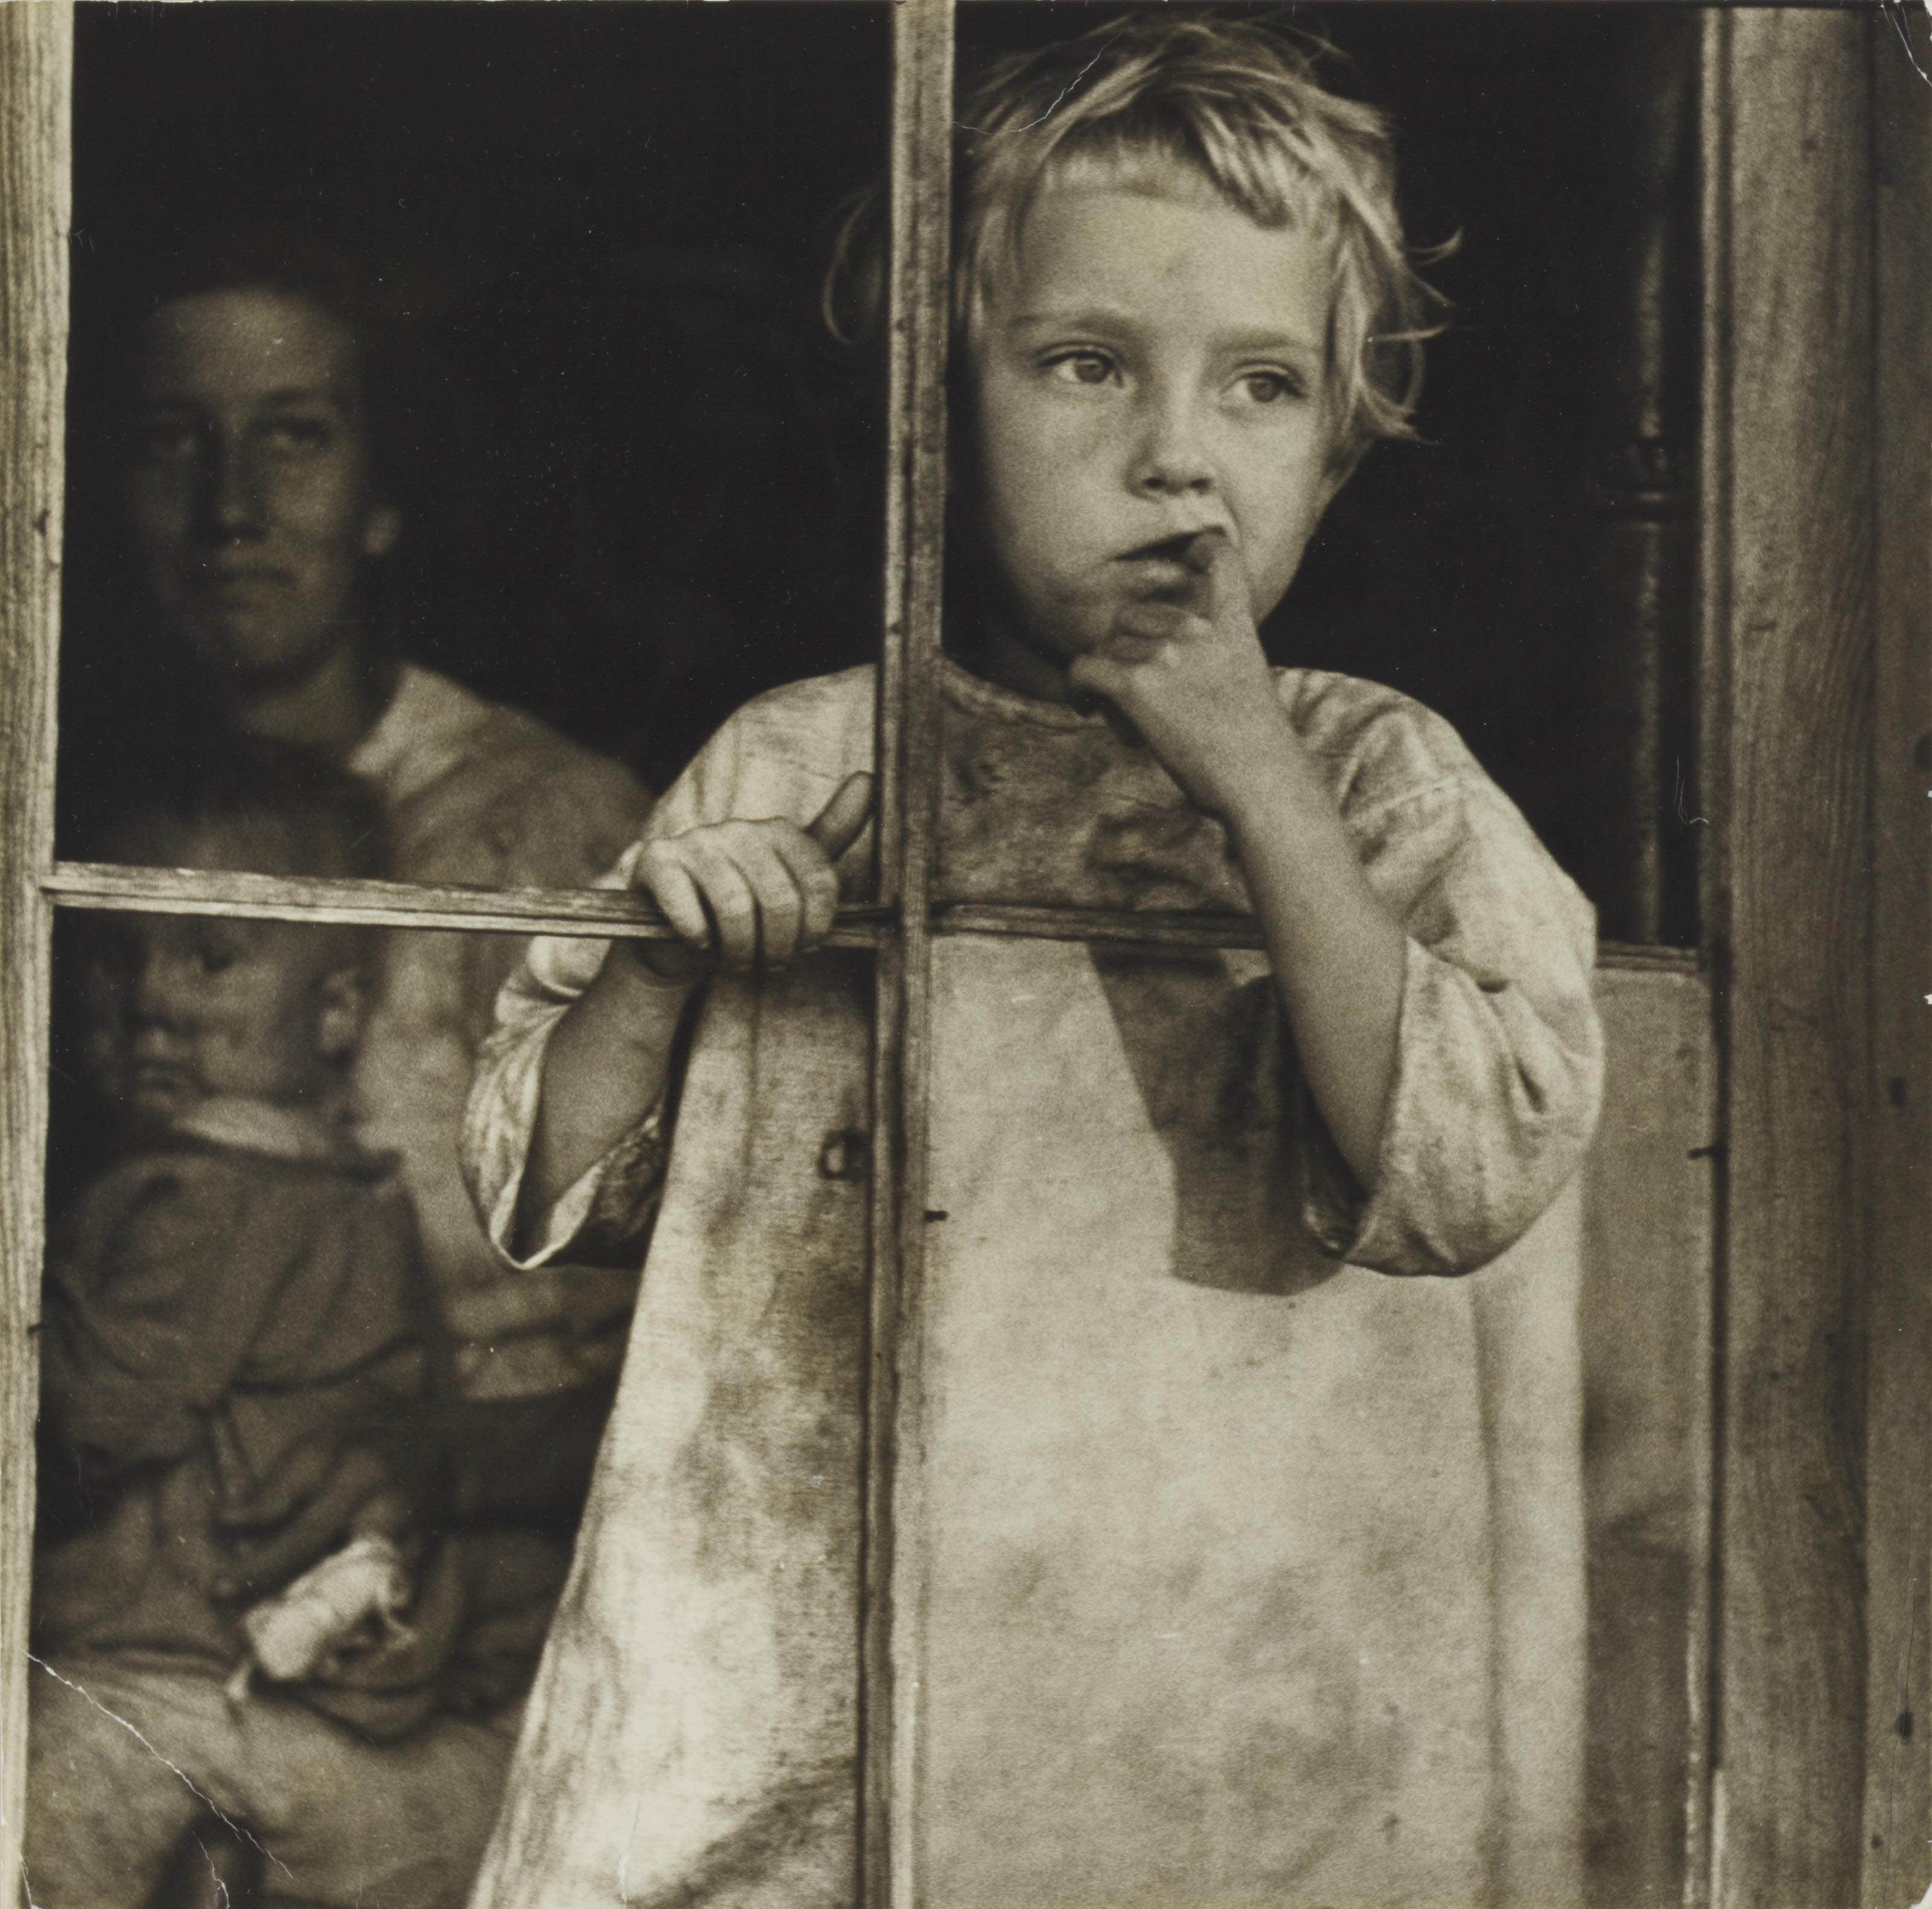 Sharecropper's Daughter, Arkansas, 1935